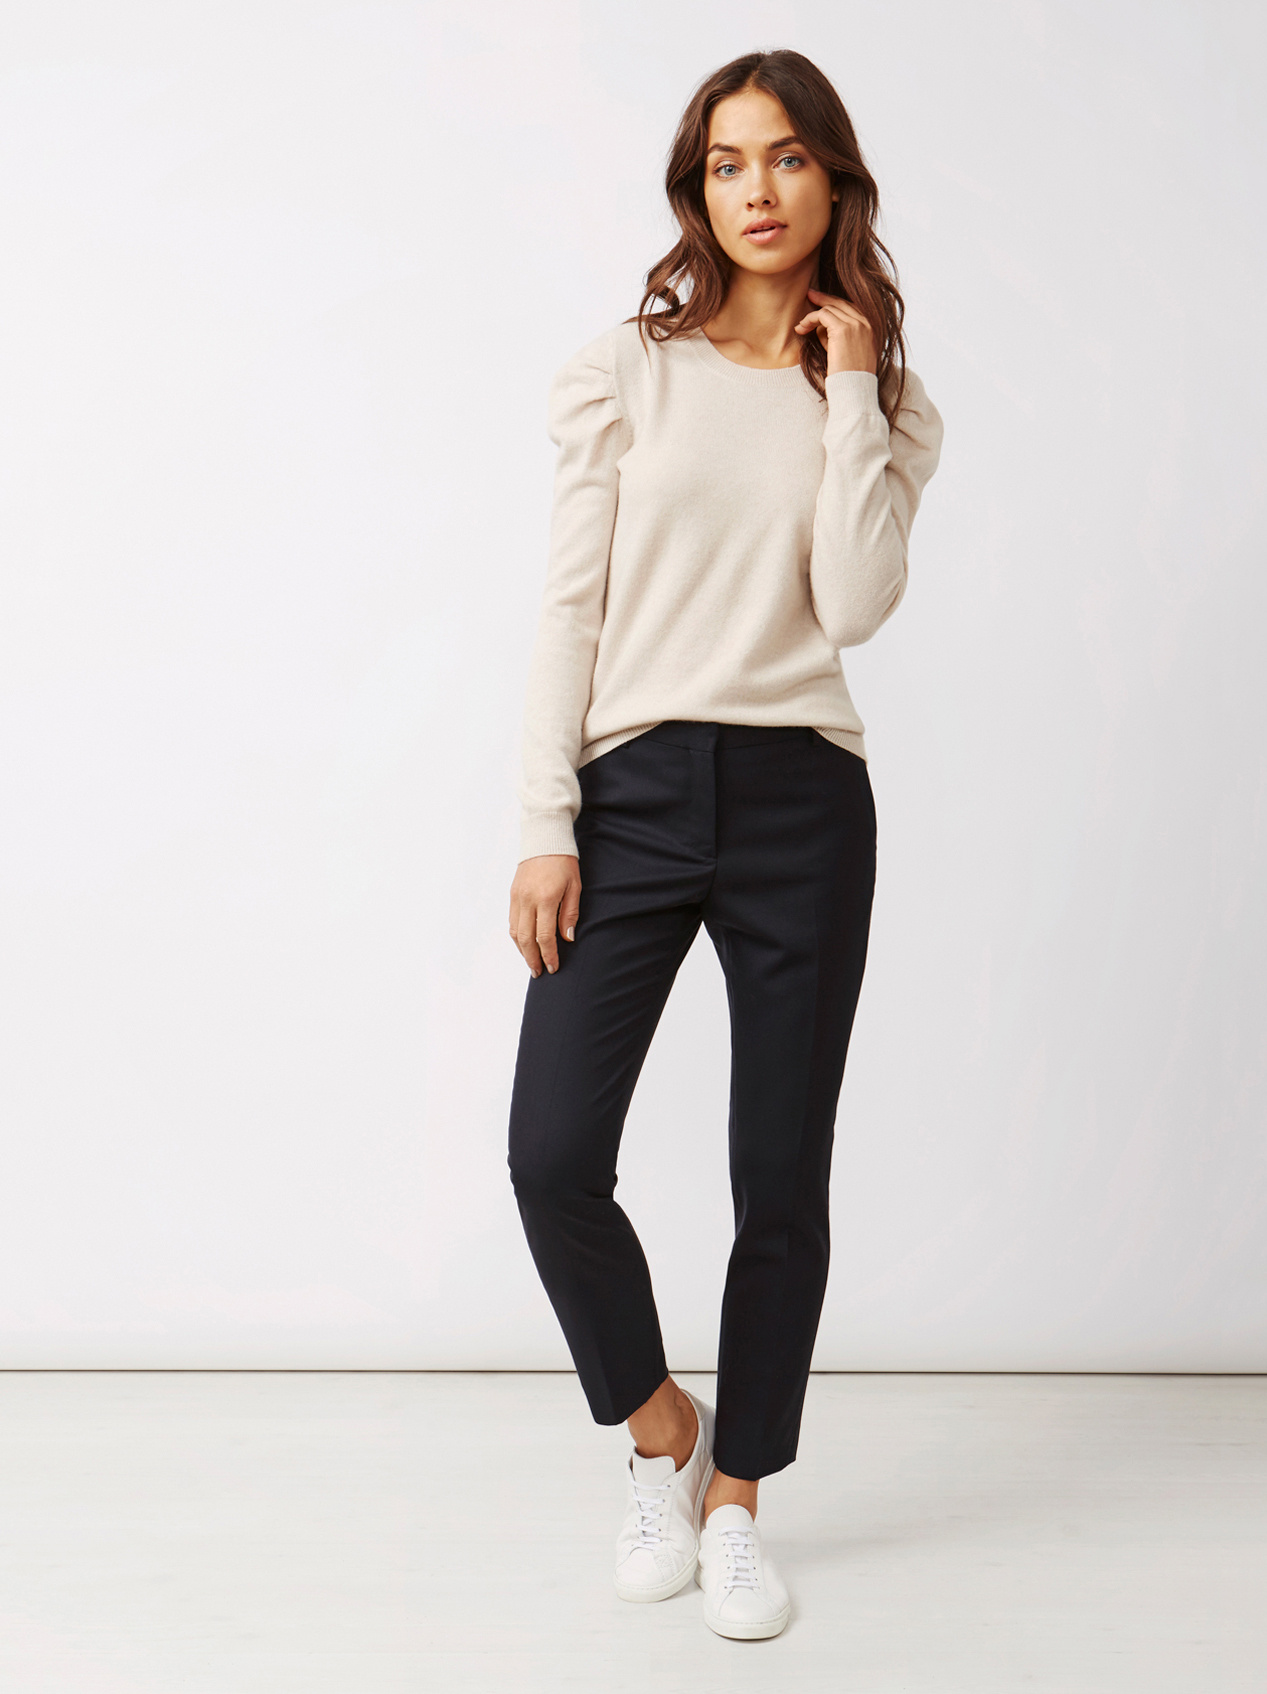 Soft Goat Women's Puff Shoulder Sweater Beige